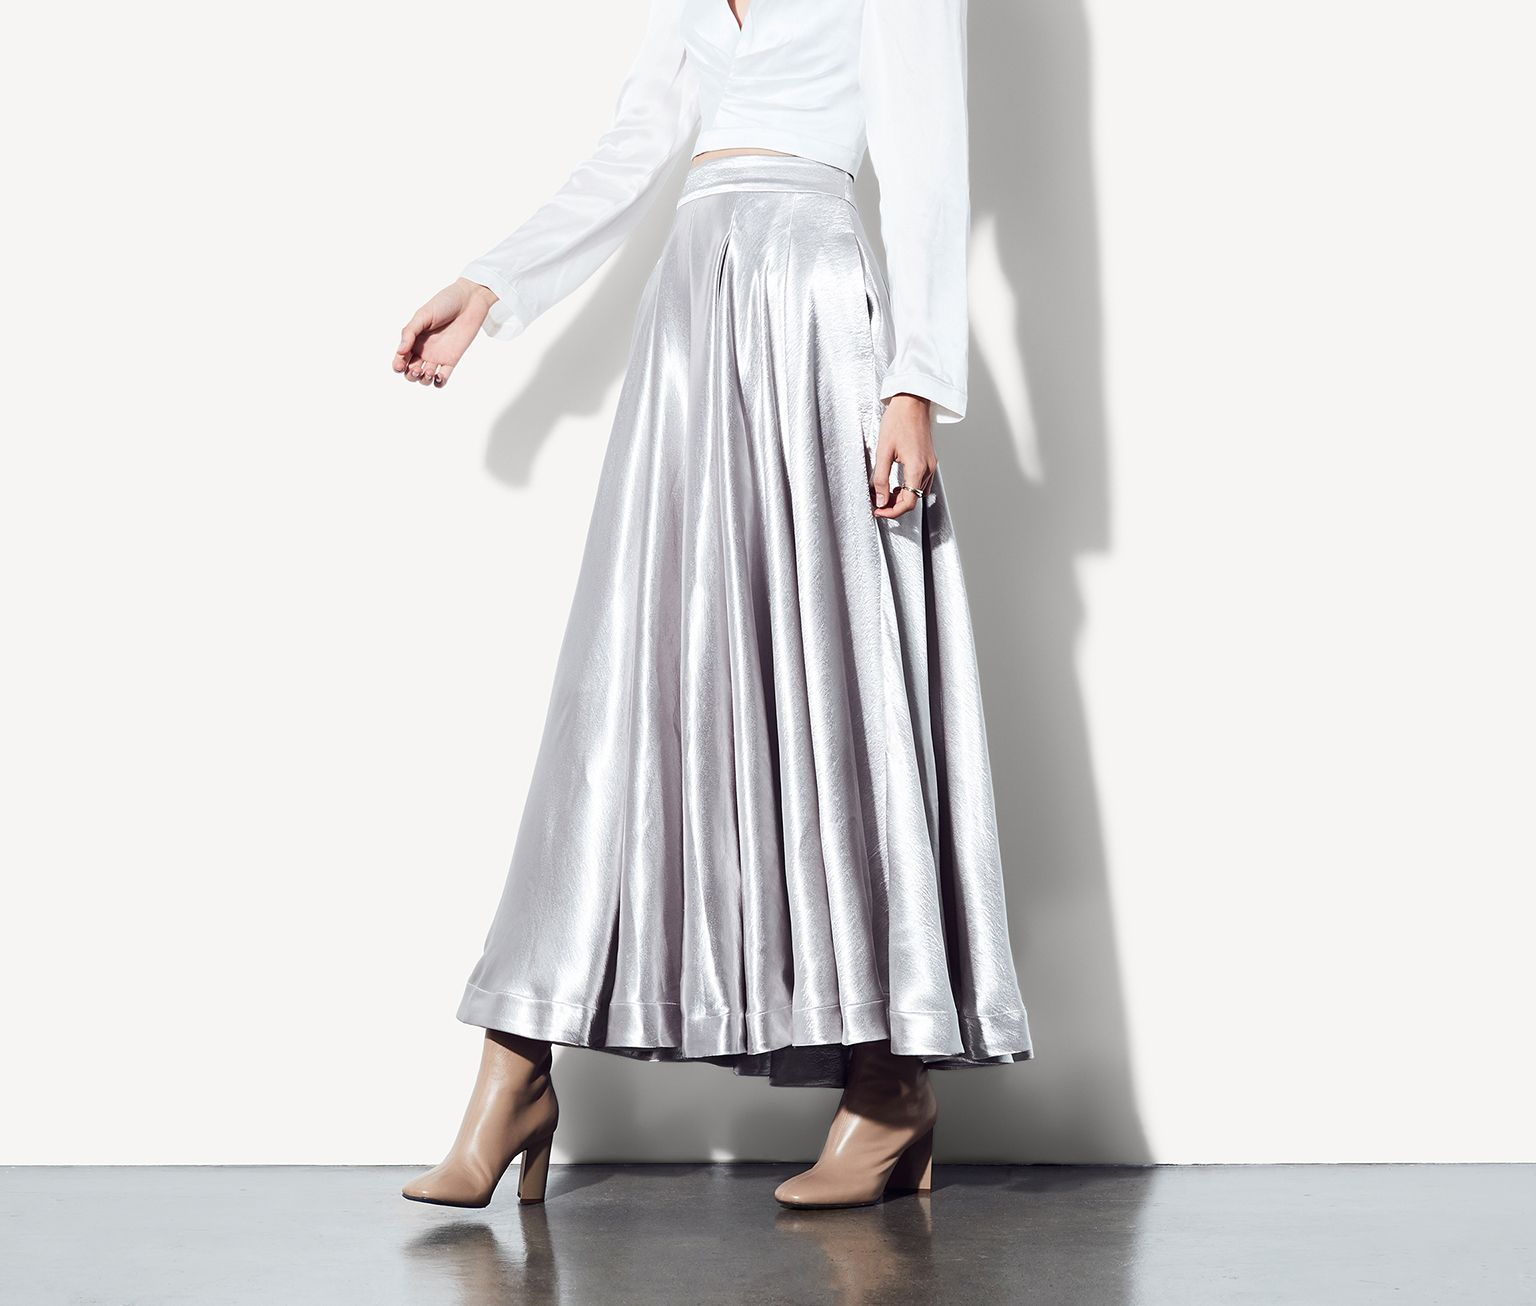 Silver The Meni Skirt Dress | Fame & Partners USA